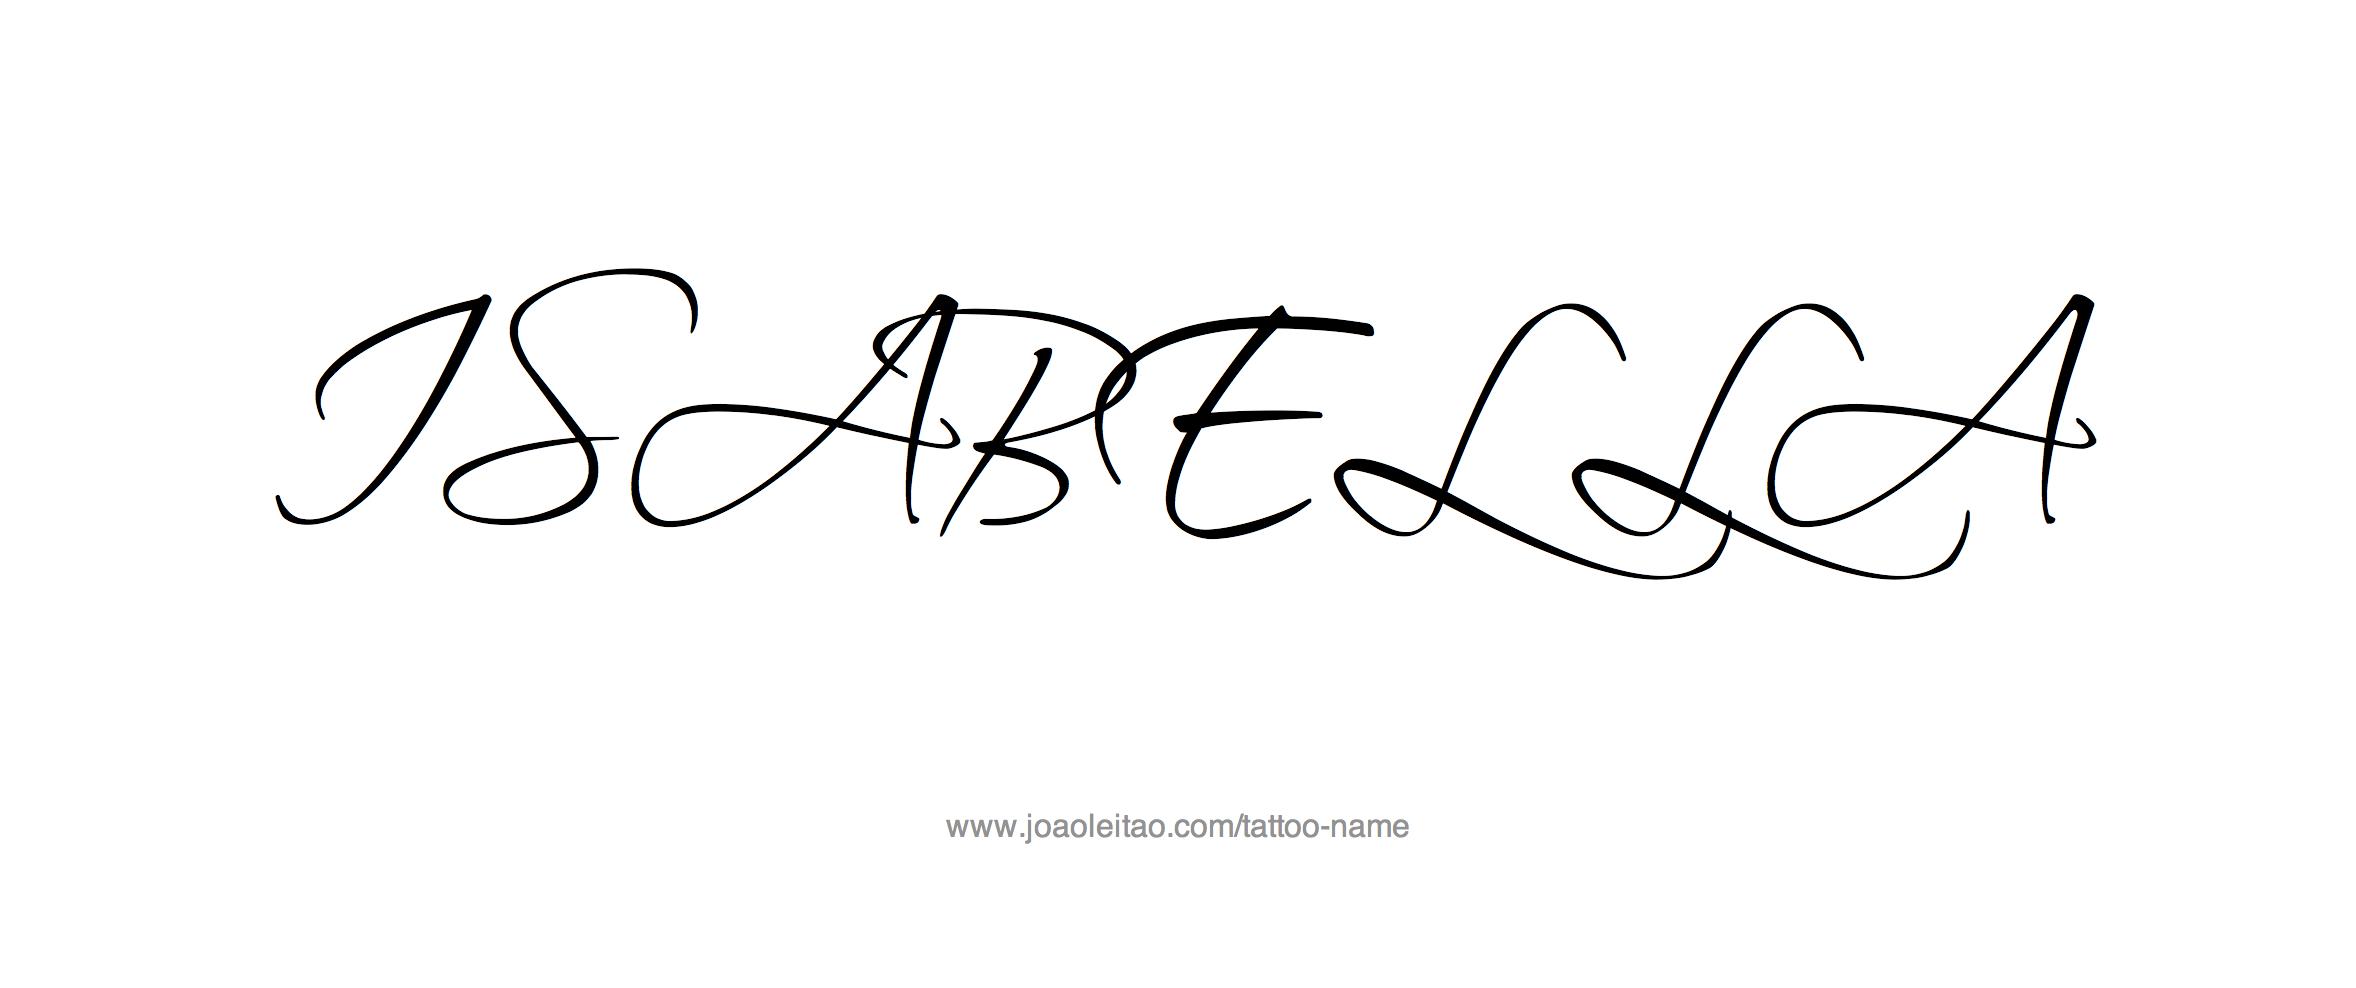 Isabella Name Tattoo Designs Tattoo Name Tattoo Designs Name